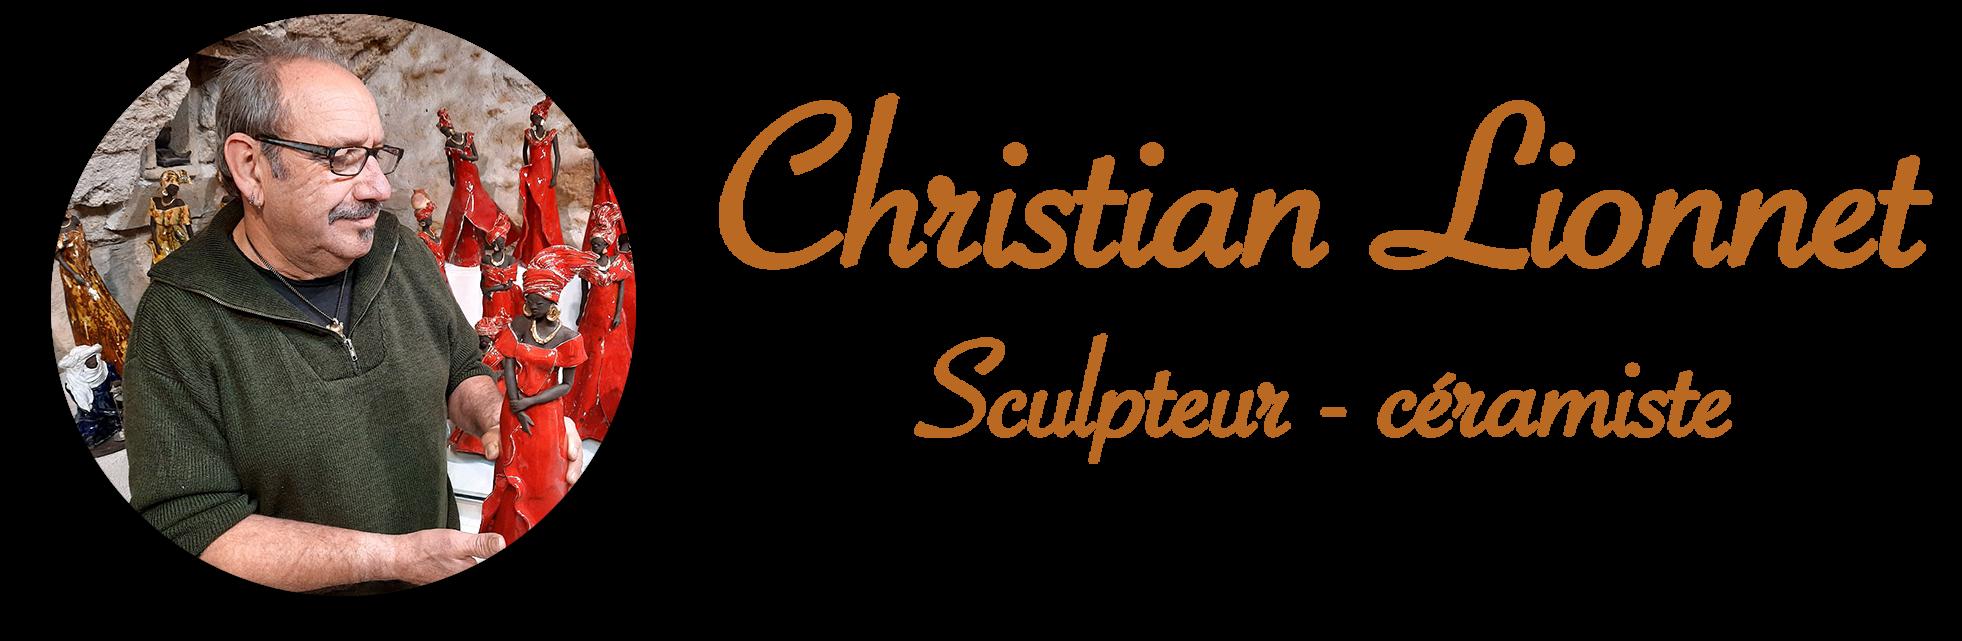 Christian Lionnet